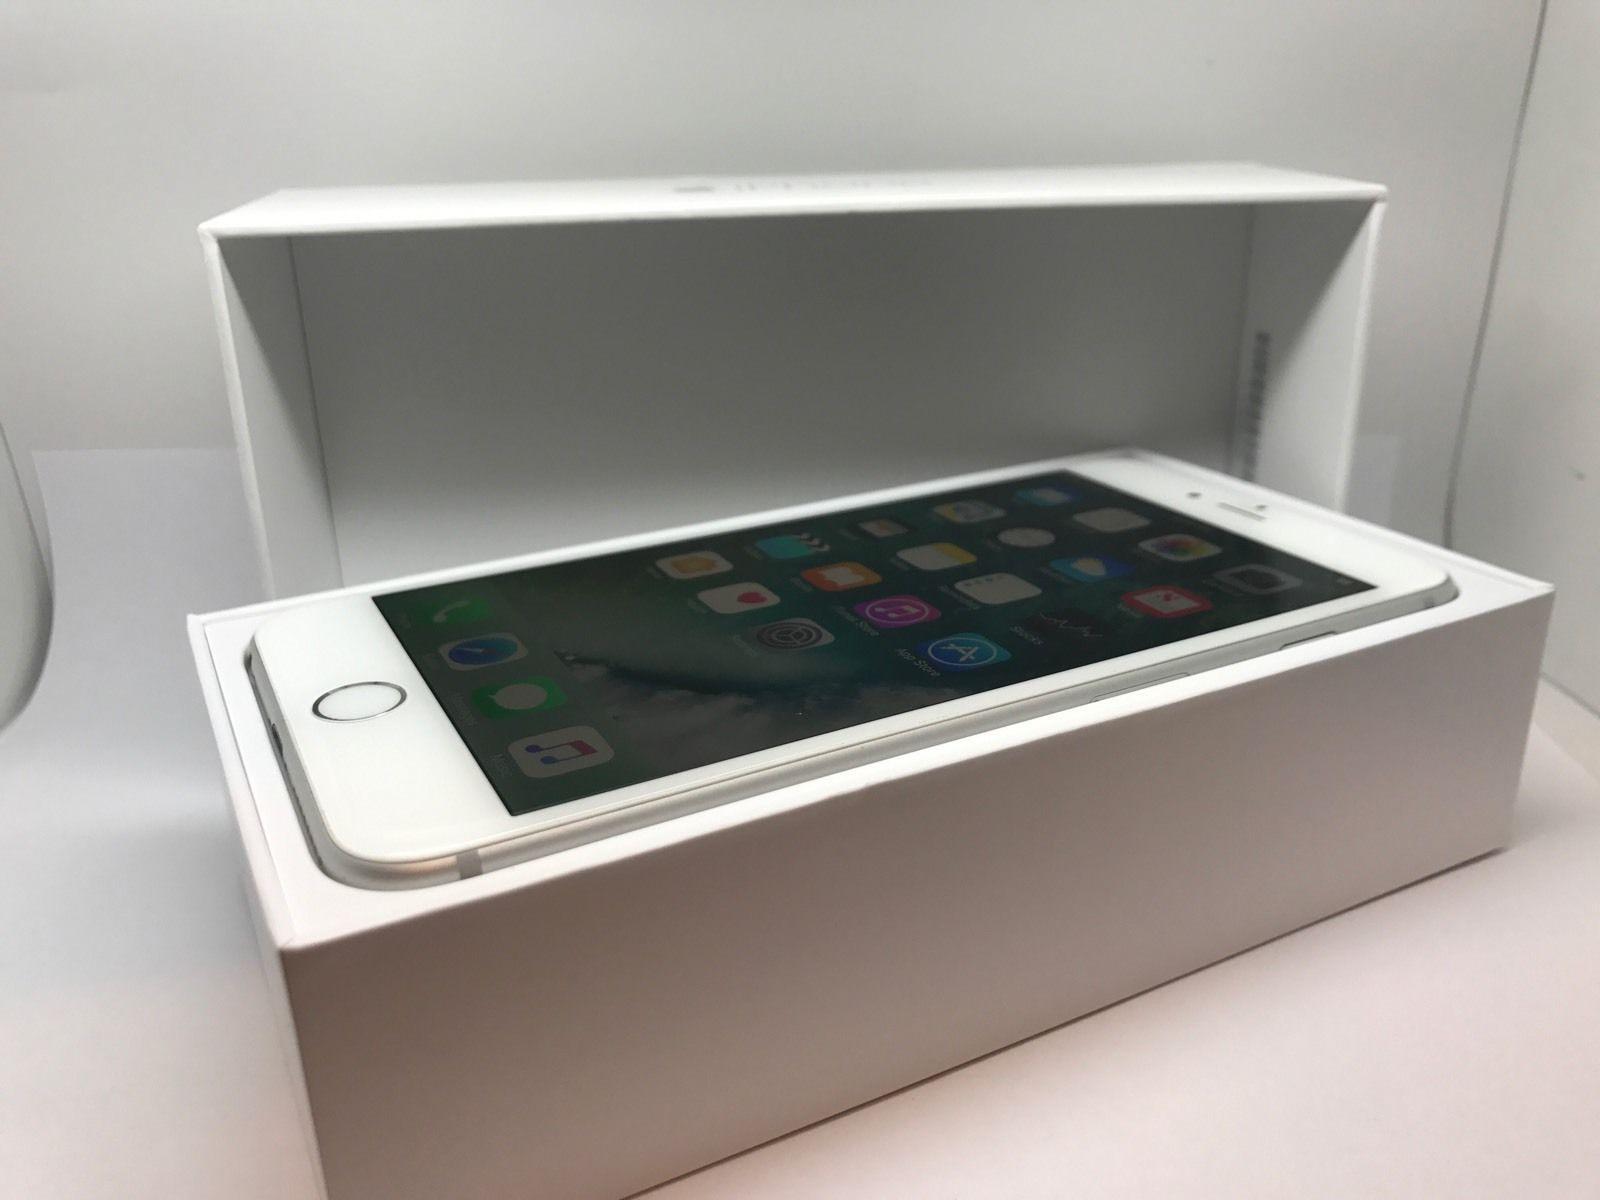 d53863fb912 Apple iPhone 6 Plus-16GB 64GB GSM Factory Unlocked Smartphone Gold Gray  Silver*